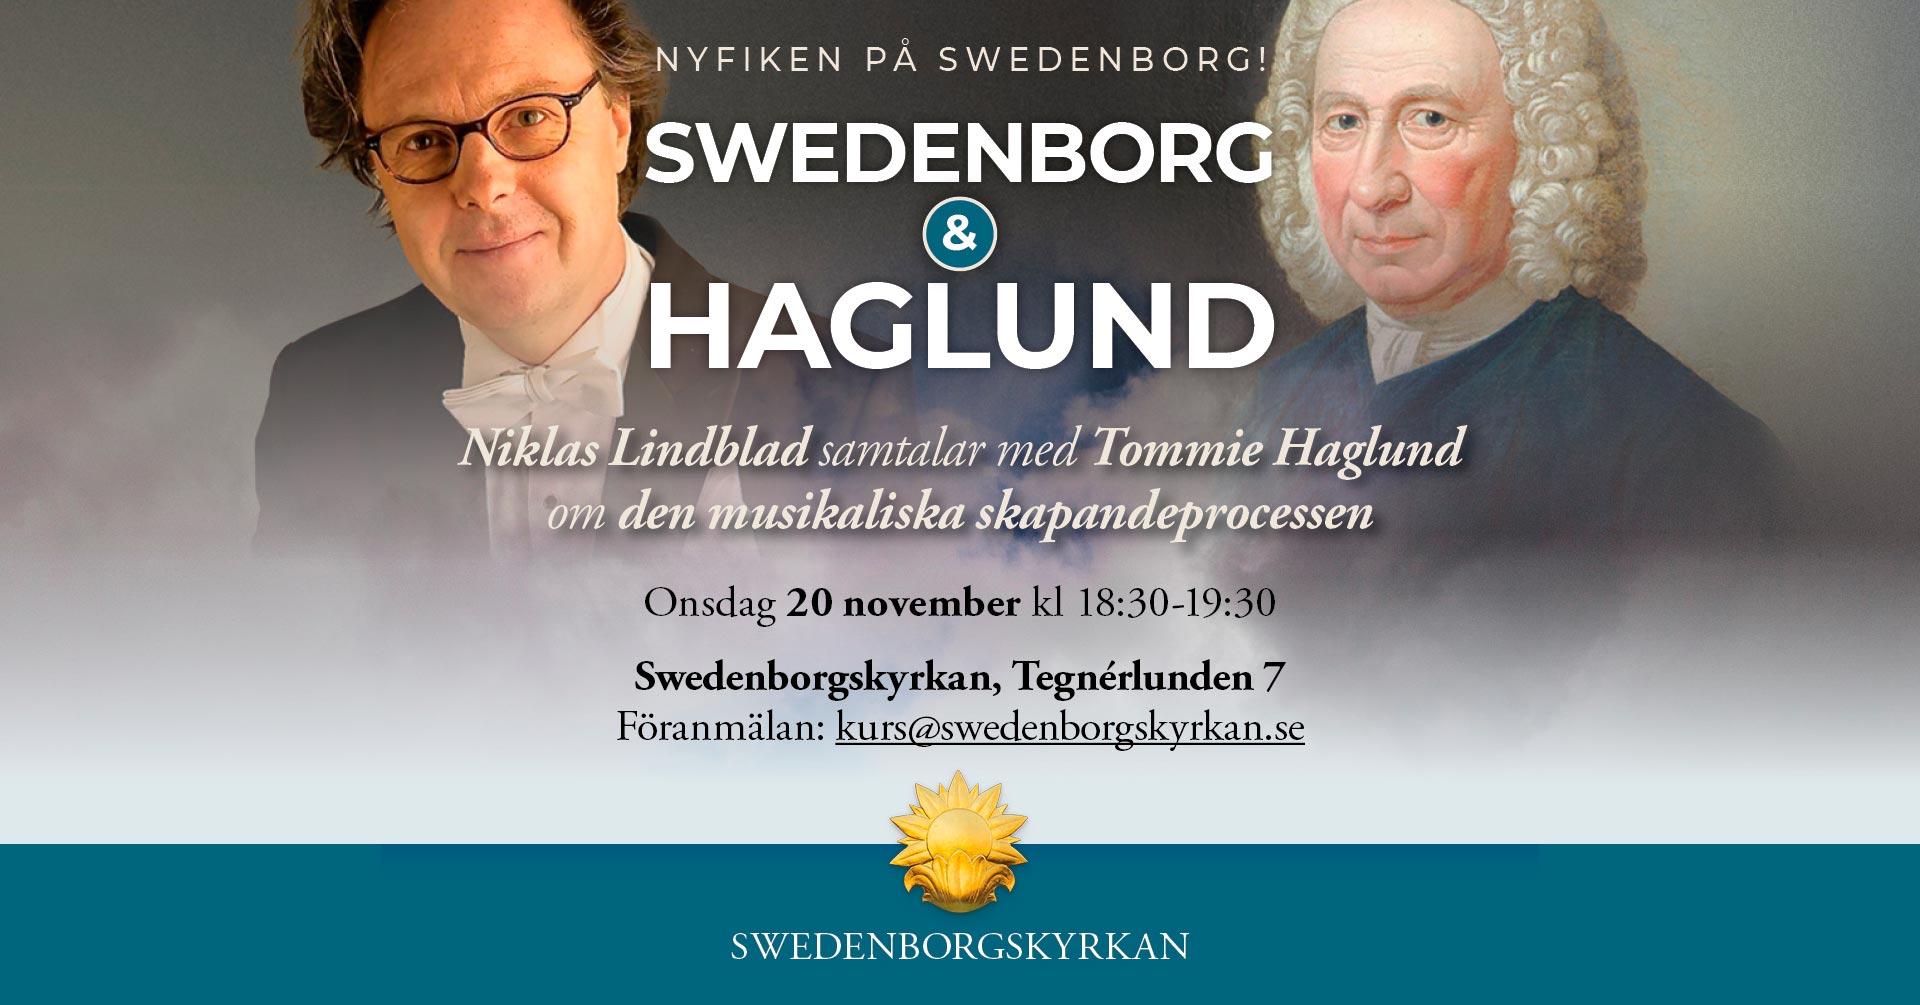 Swedenborg & haglund